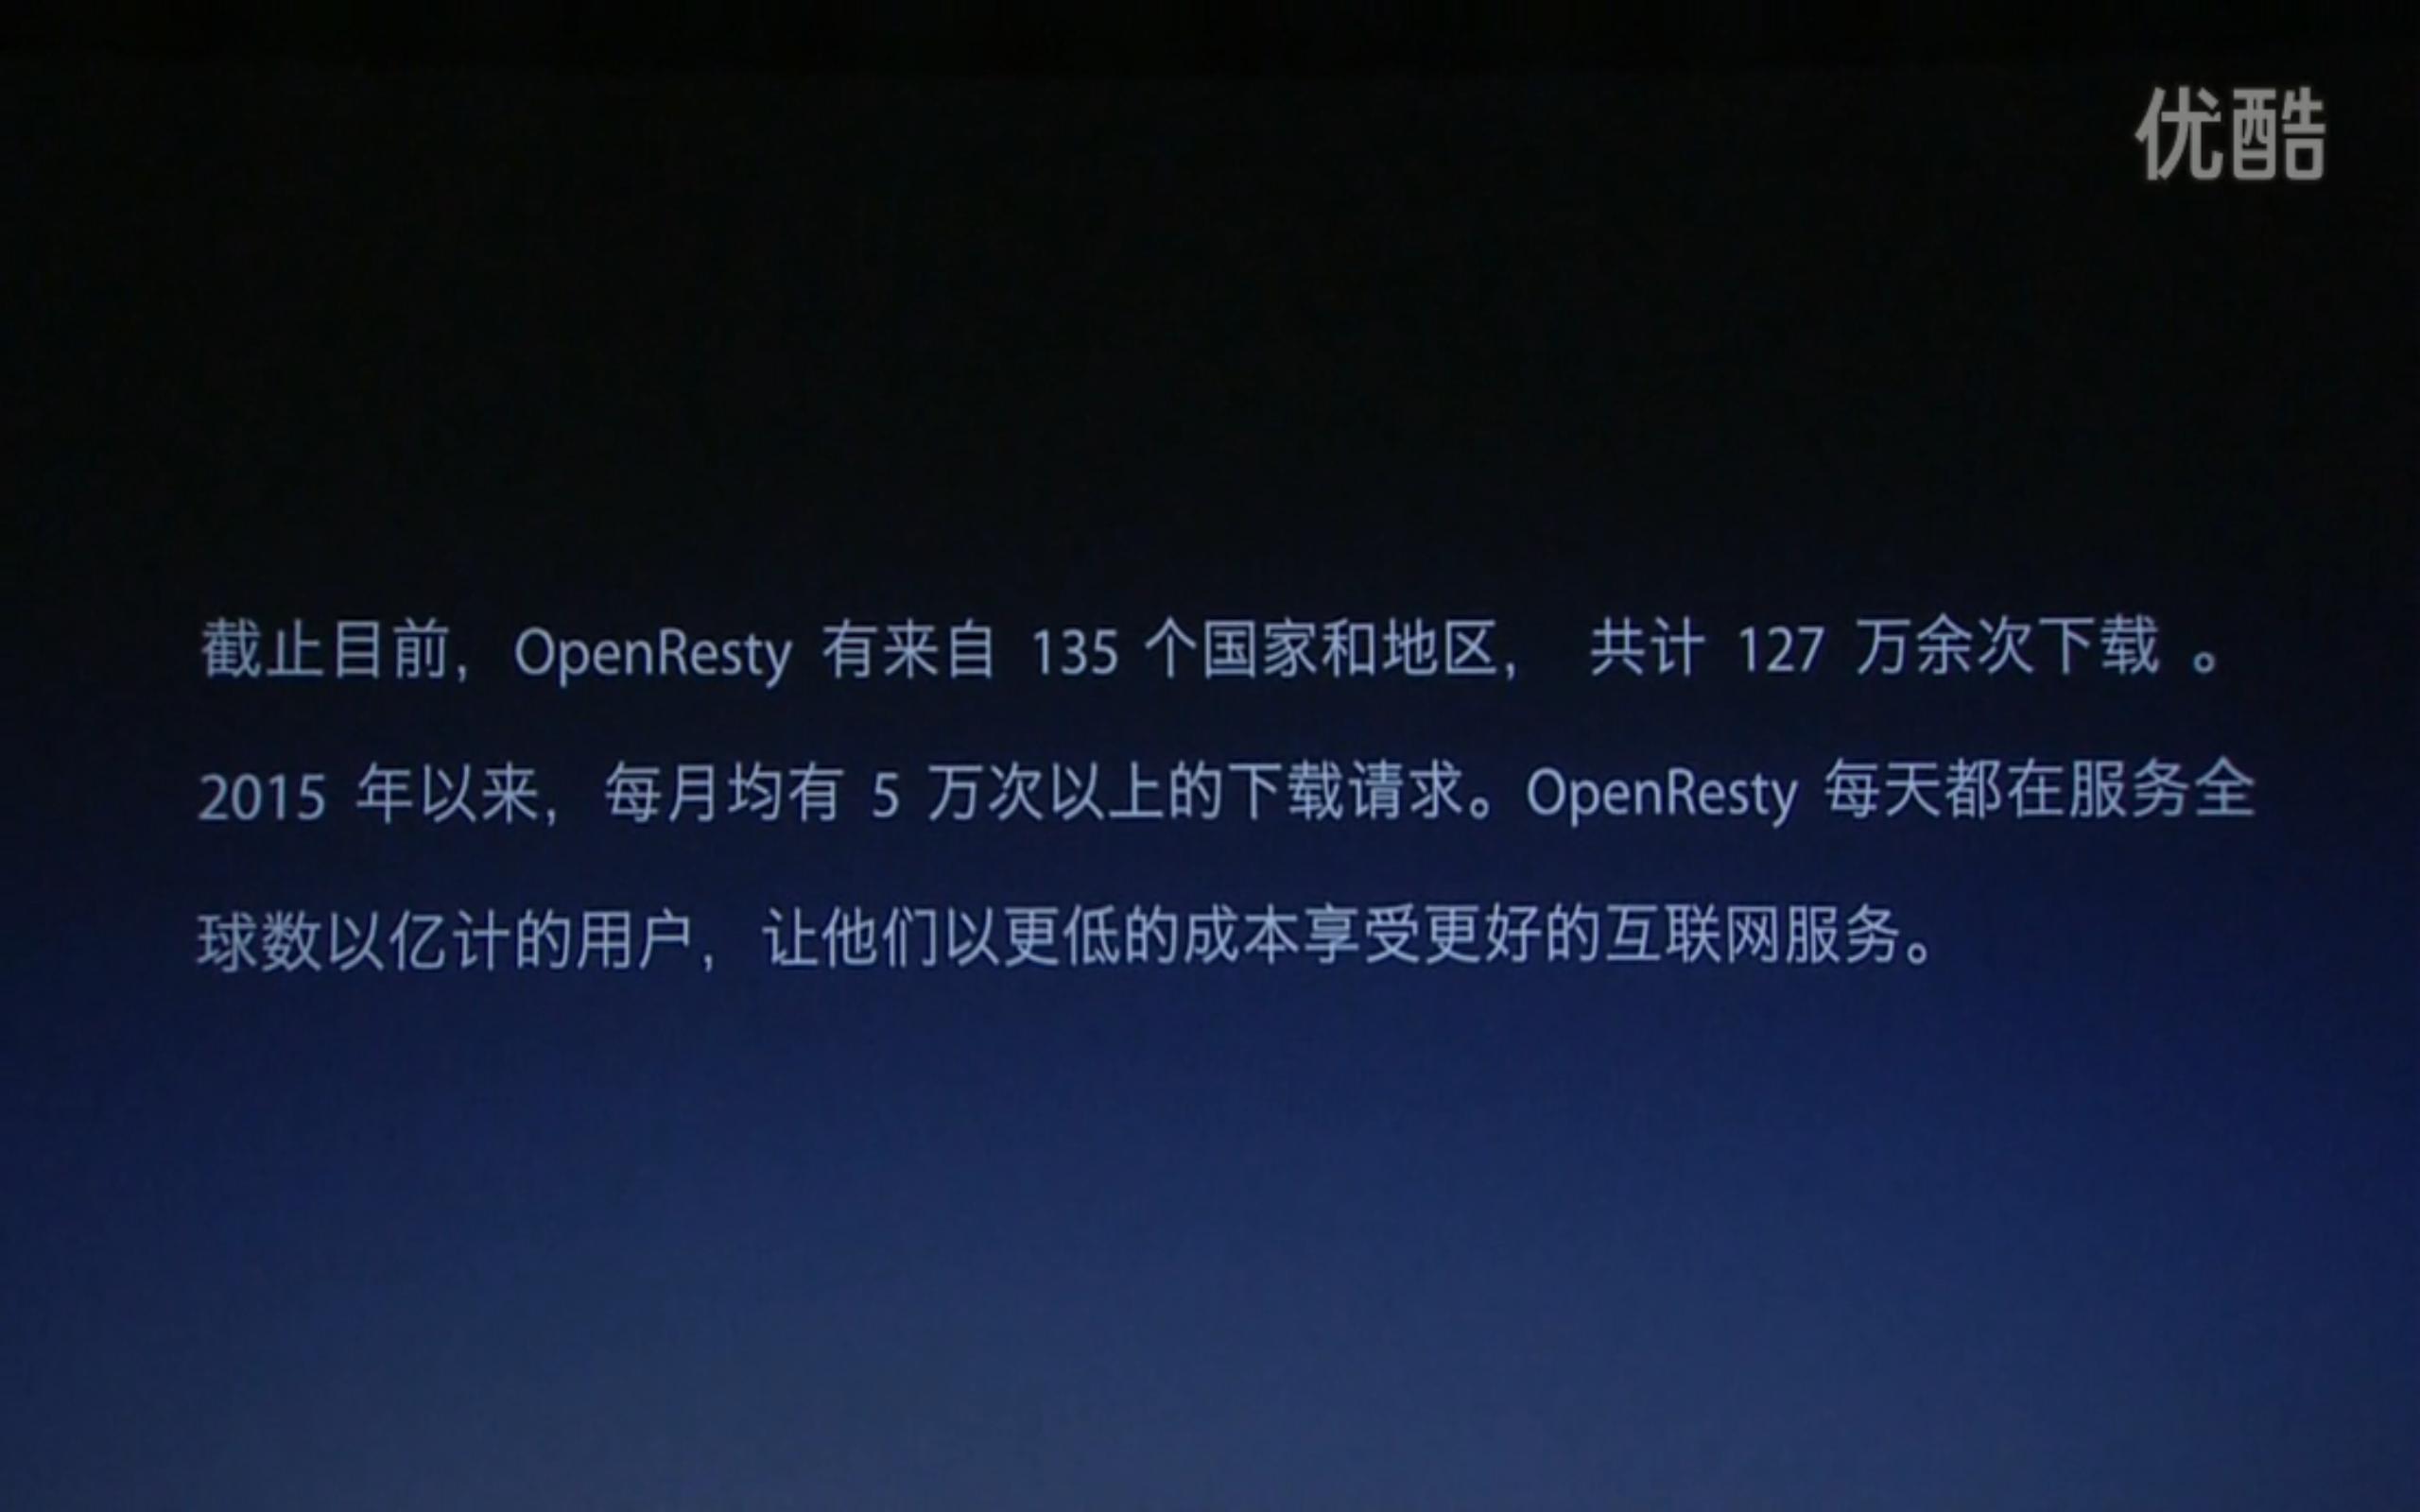 openresty-3